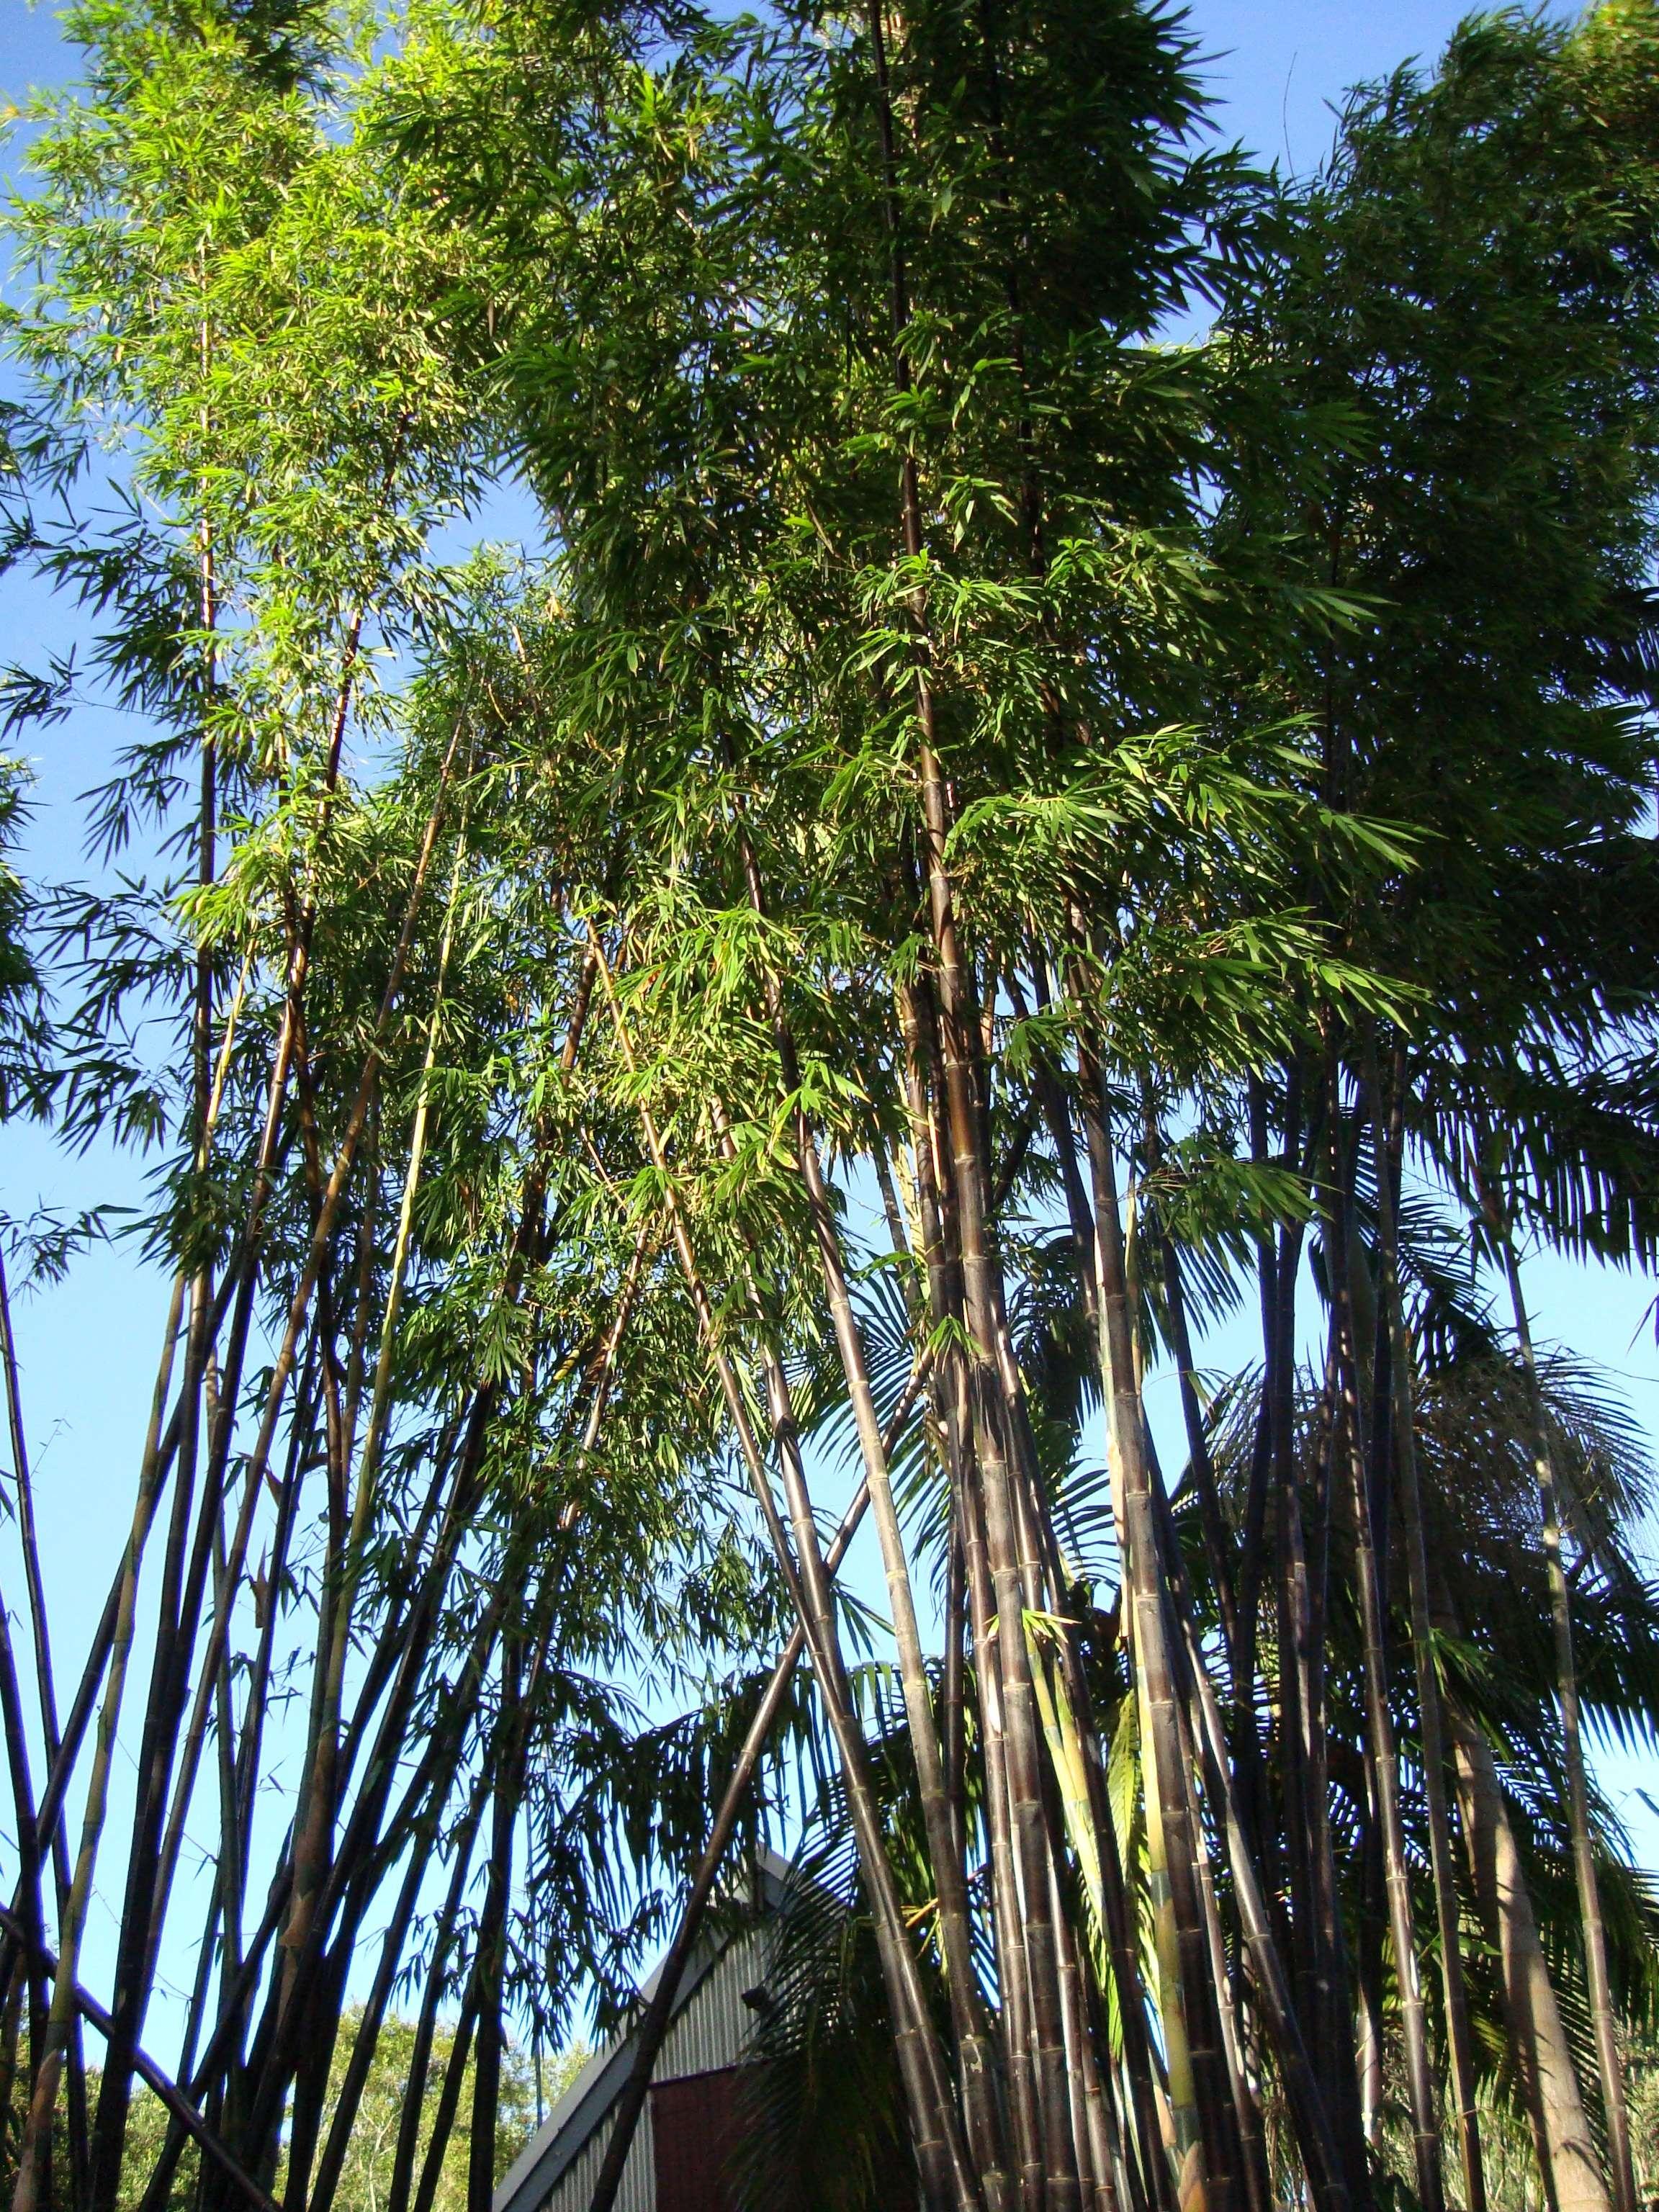 The amazing world of Bamboo